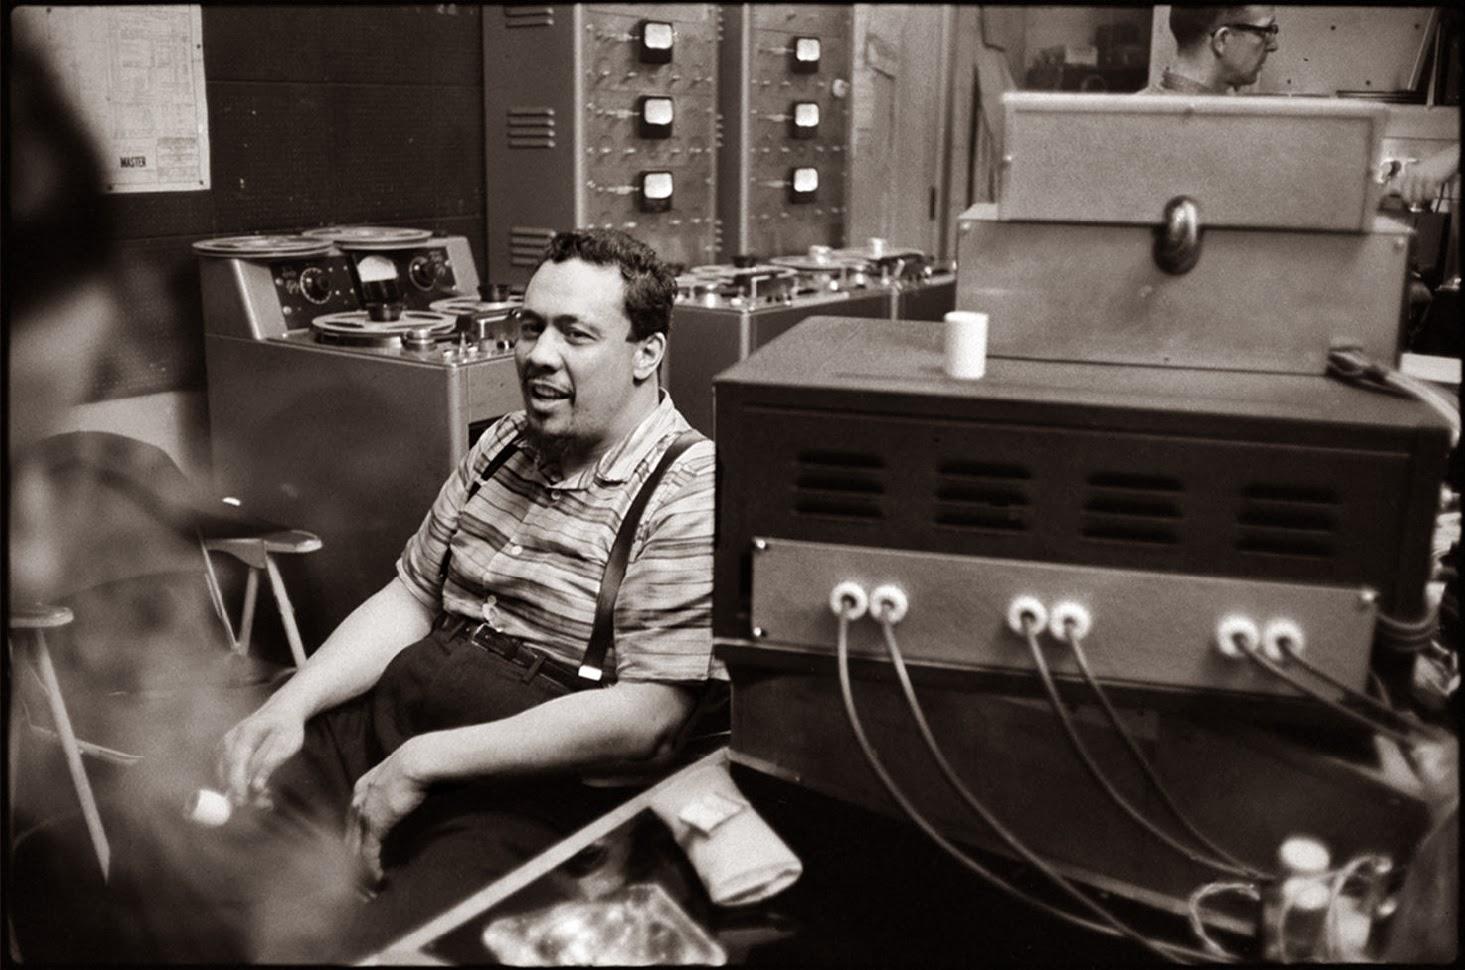 Review: Charles Mingus - Mingus Ah Um - ORG Original Recordings Group 2LP 45rpm